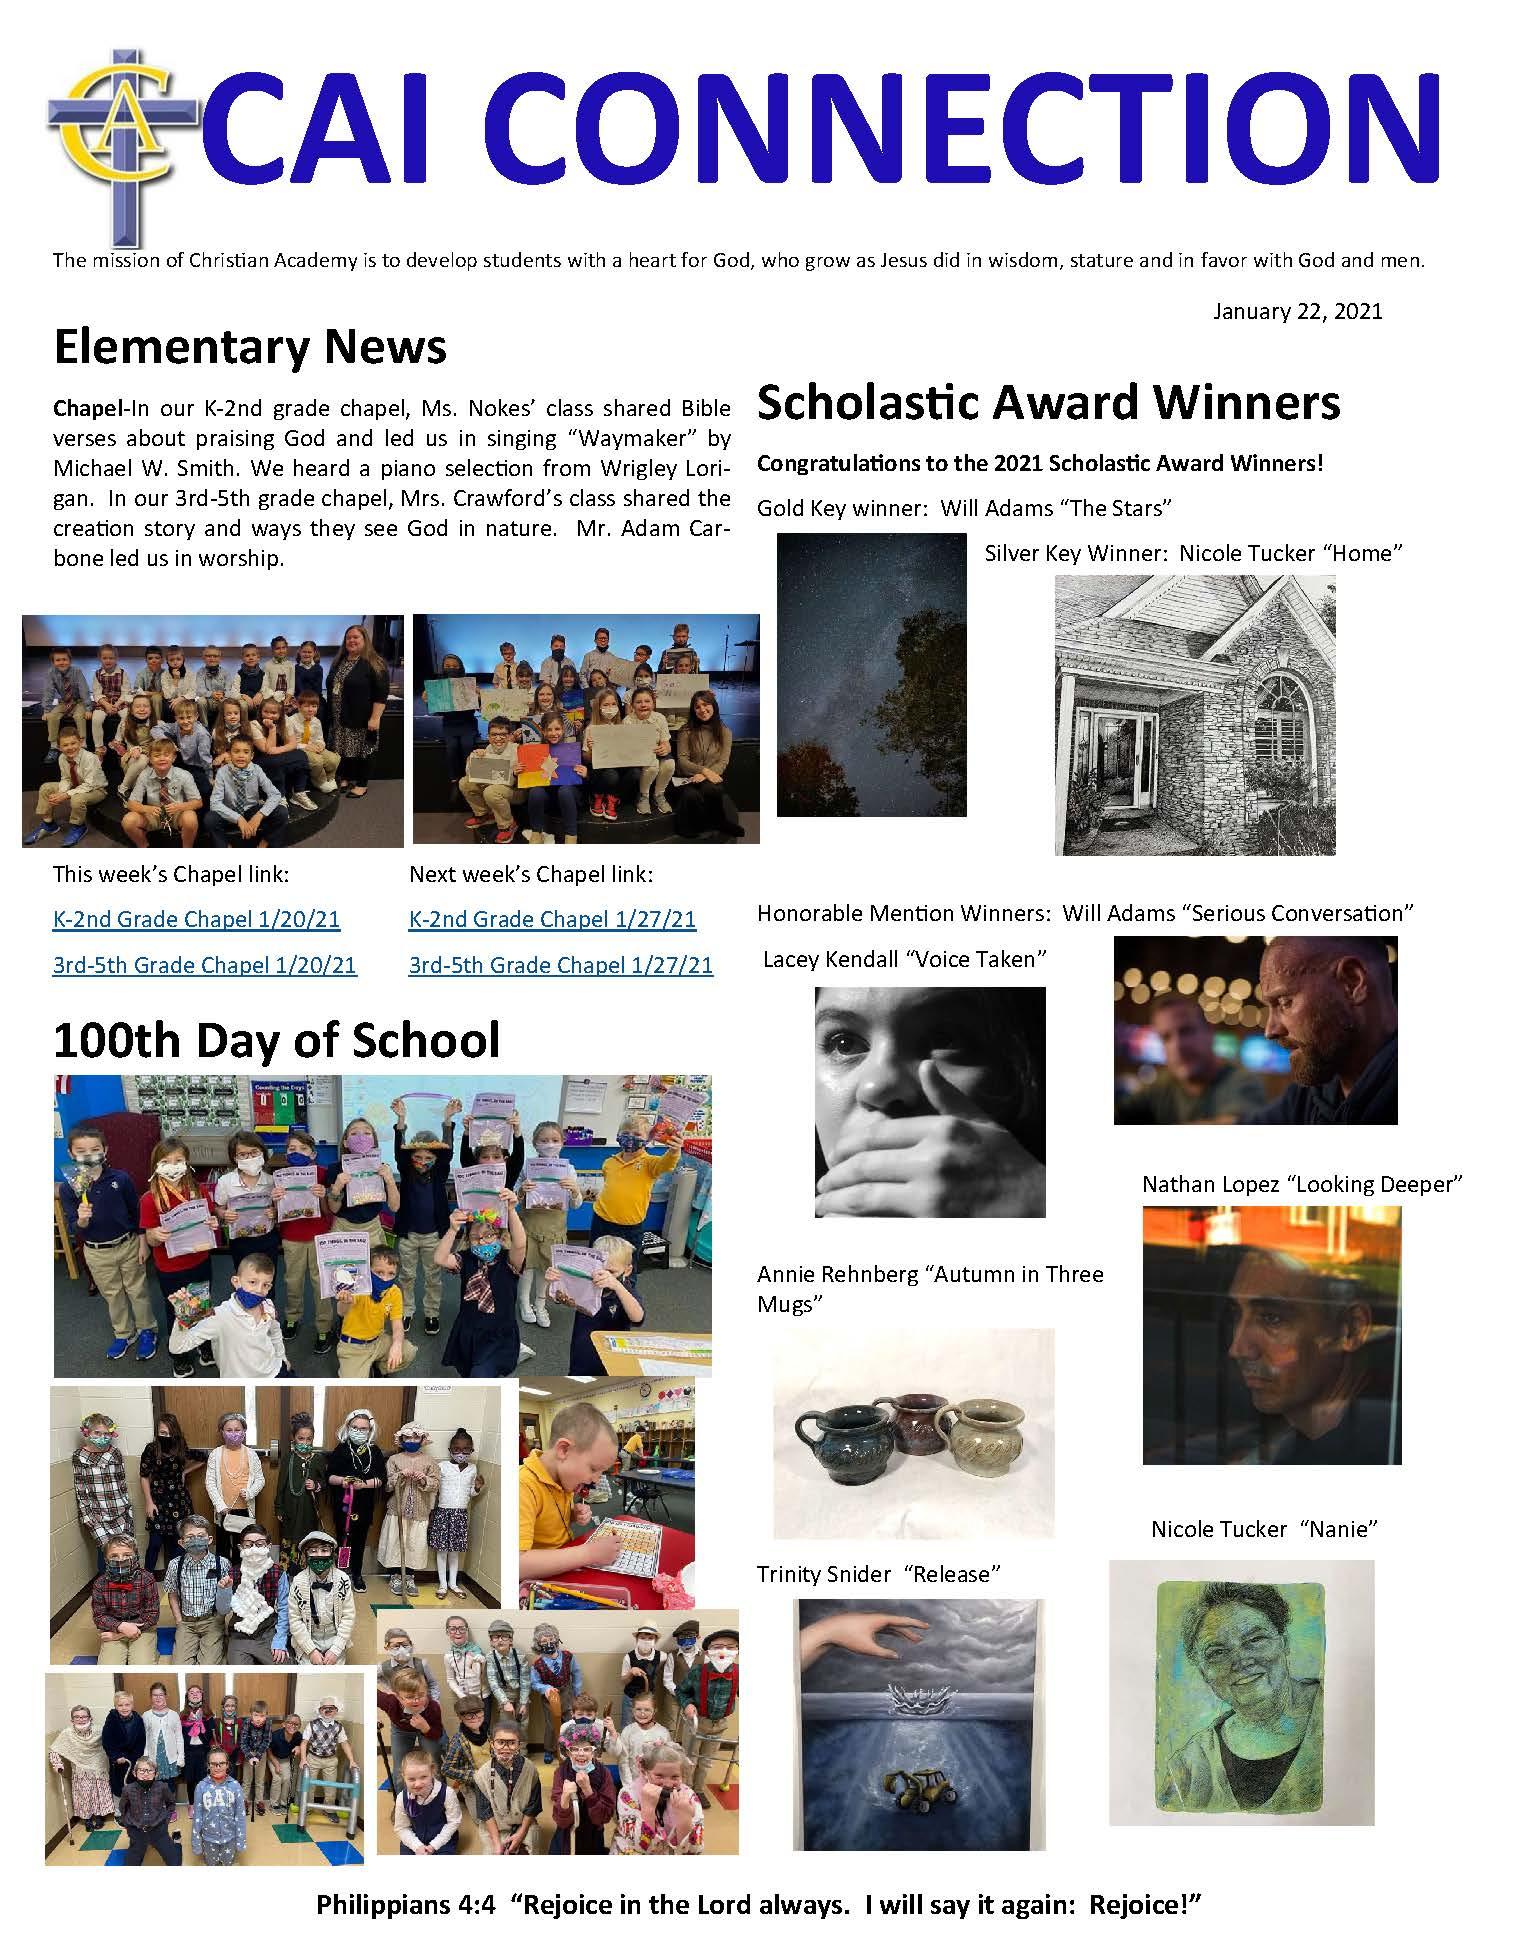 Christian Academy School System   Christian Academy of Indiana   CAI Connection   January 15, 2021